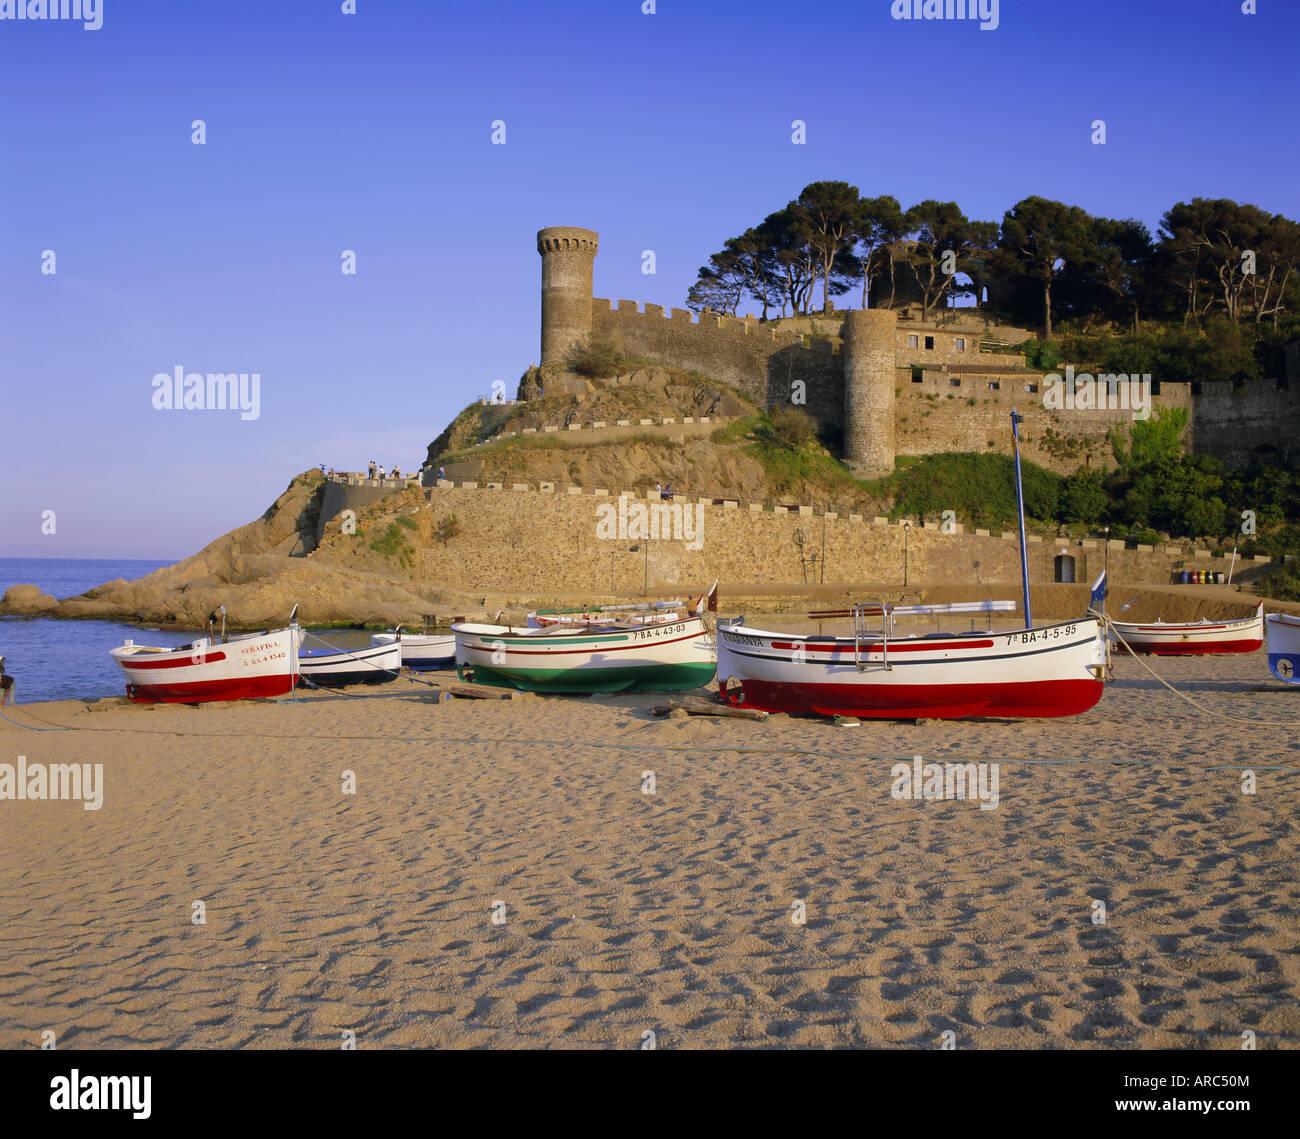 Tossa de Mar, Costa Brava, Catalunya (Katalonien) (Cataluna), Spanien, Europa Stockbild